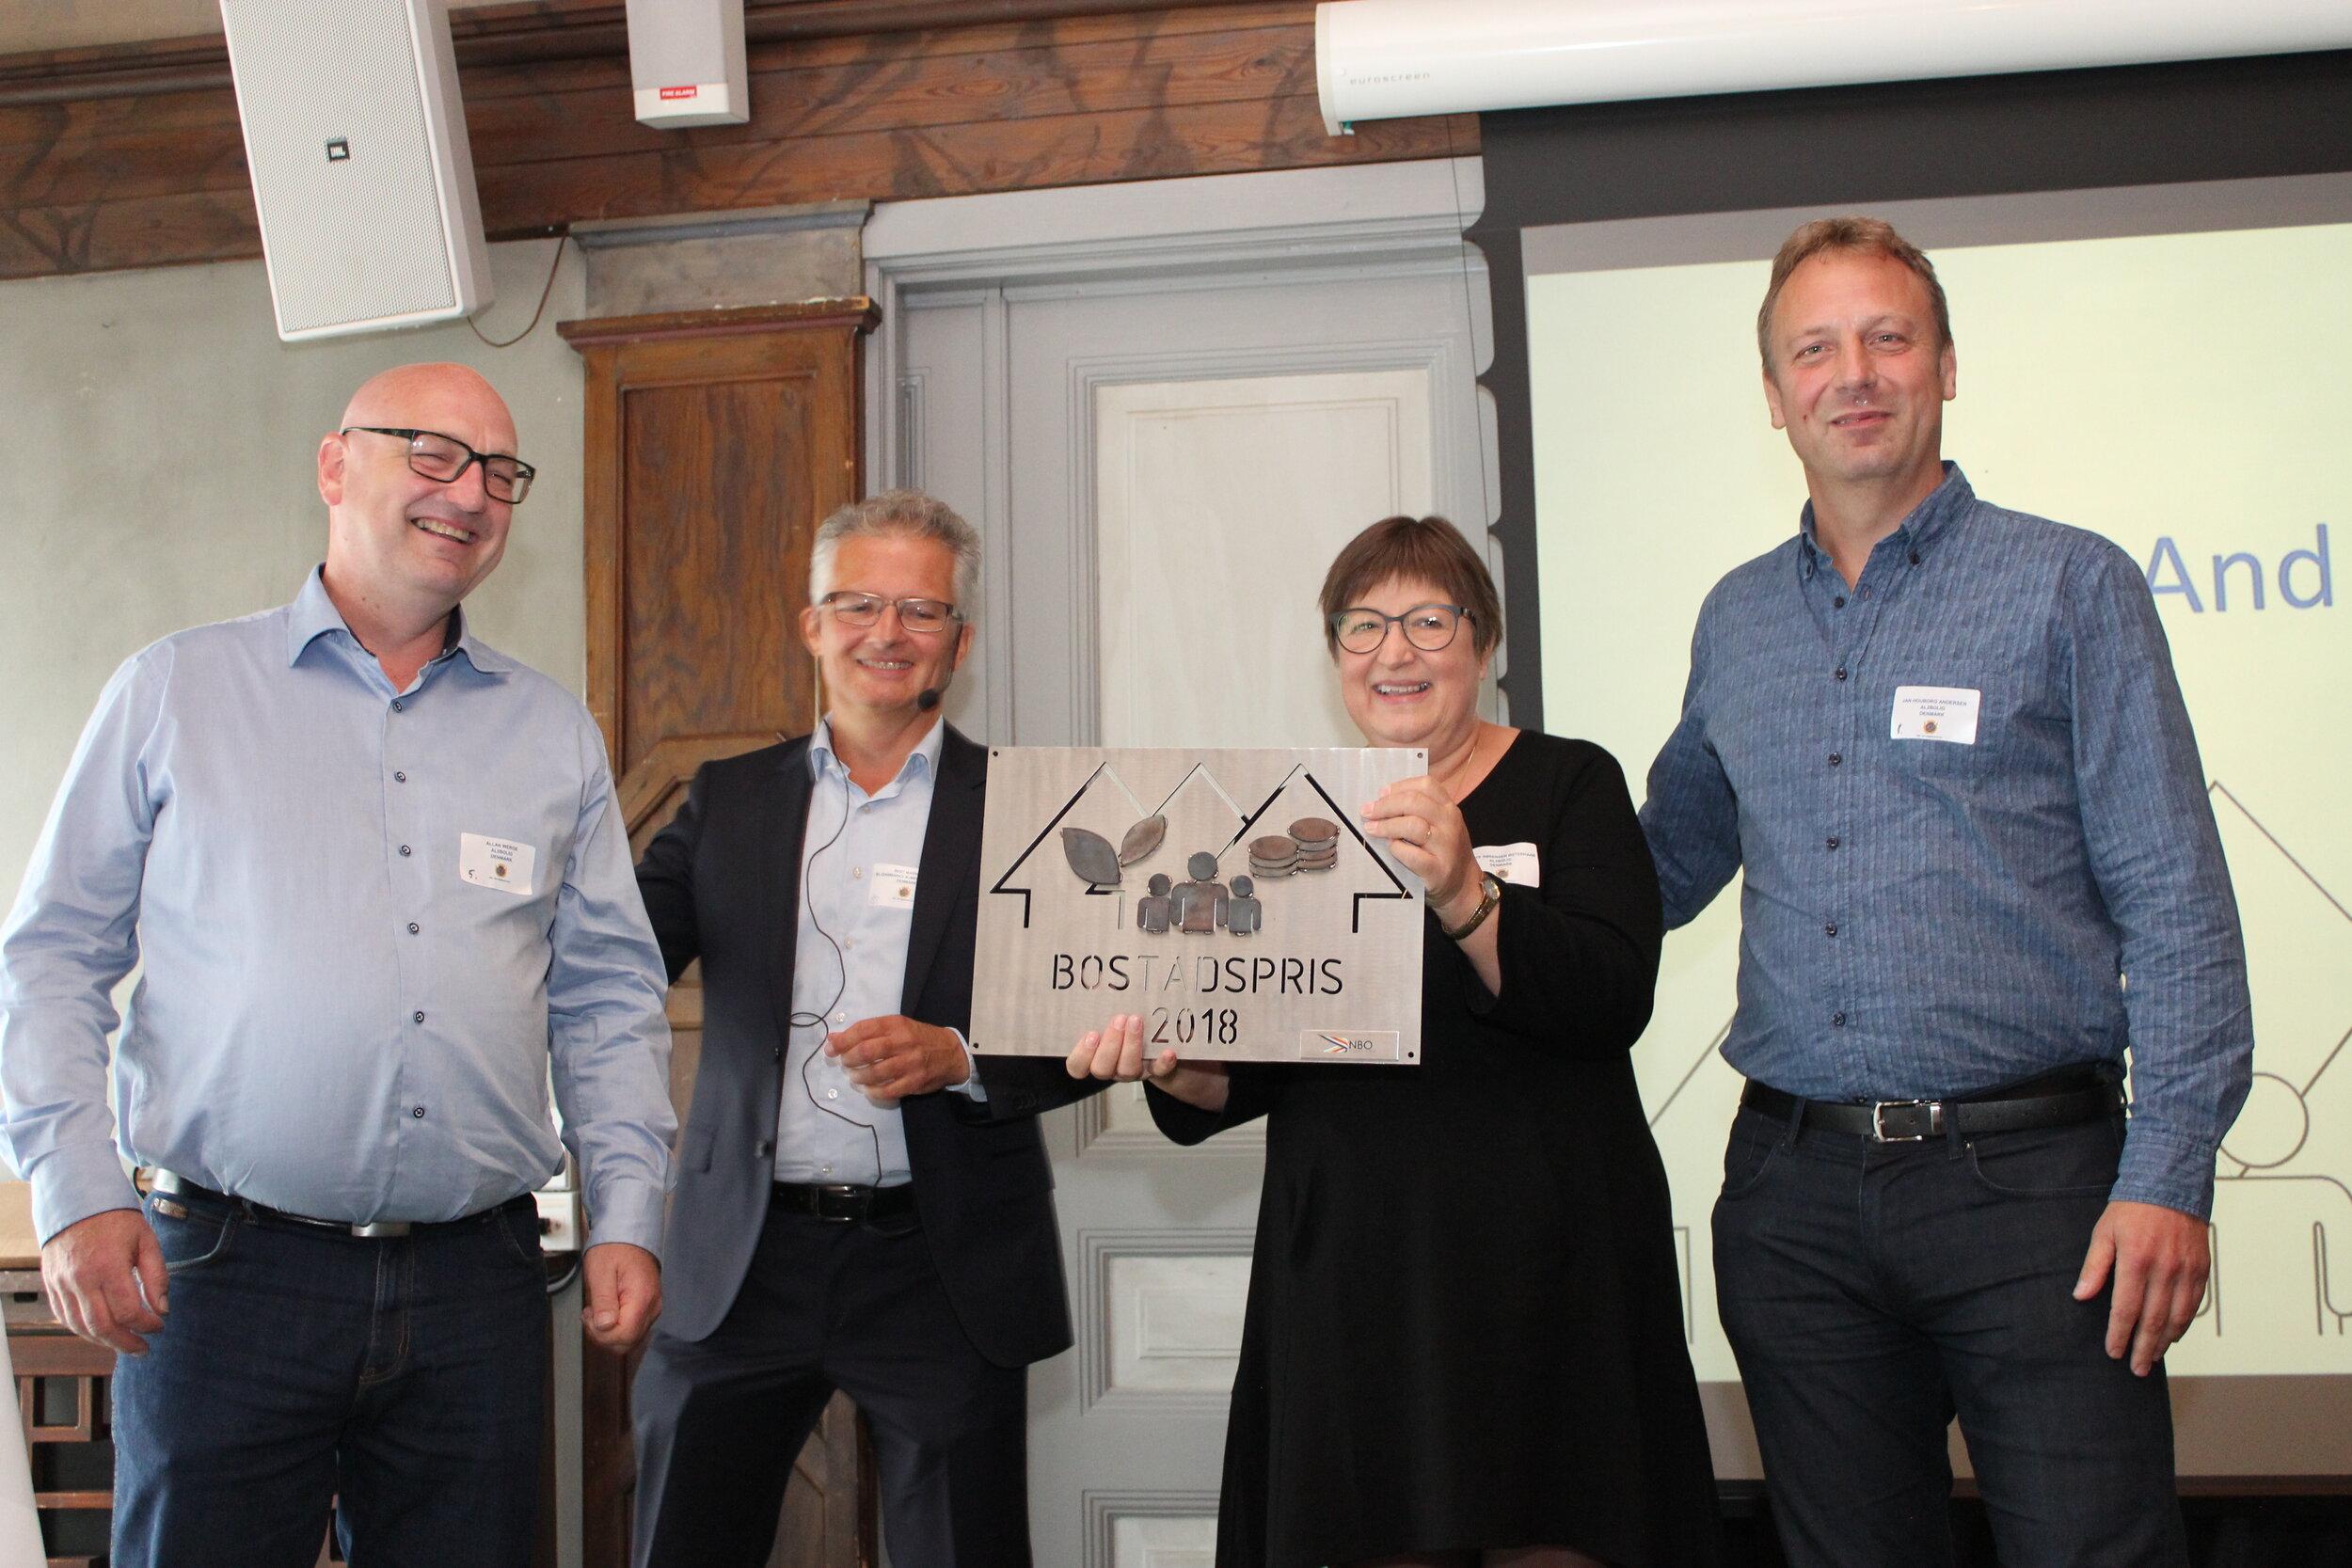 This years winner of Bostadsprisen - Langkærparken from Al2bolig in Tilst, Denmark. From right Allan Werge CEO, (Bent Madsen chairman of NBO), Anette Østerhaab Chairman, and Jan Houborg Andersen Head of the social program, in Al2bolig.